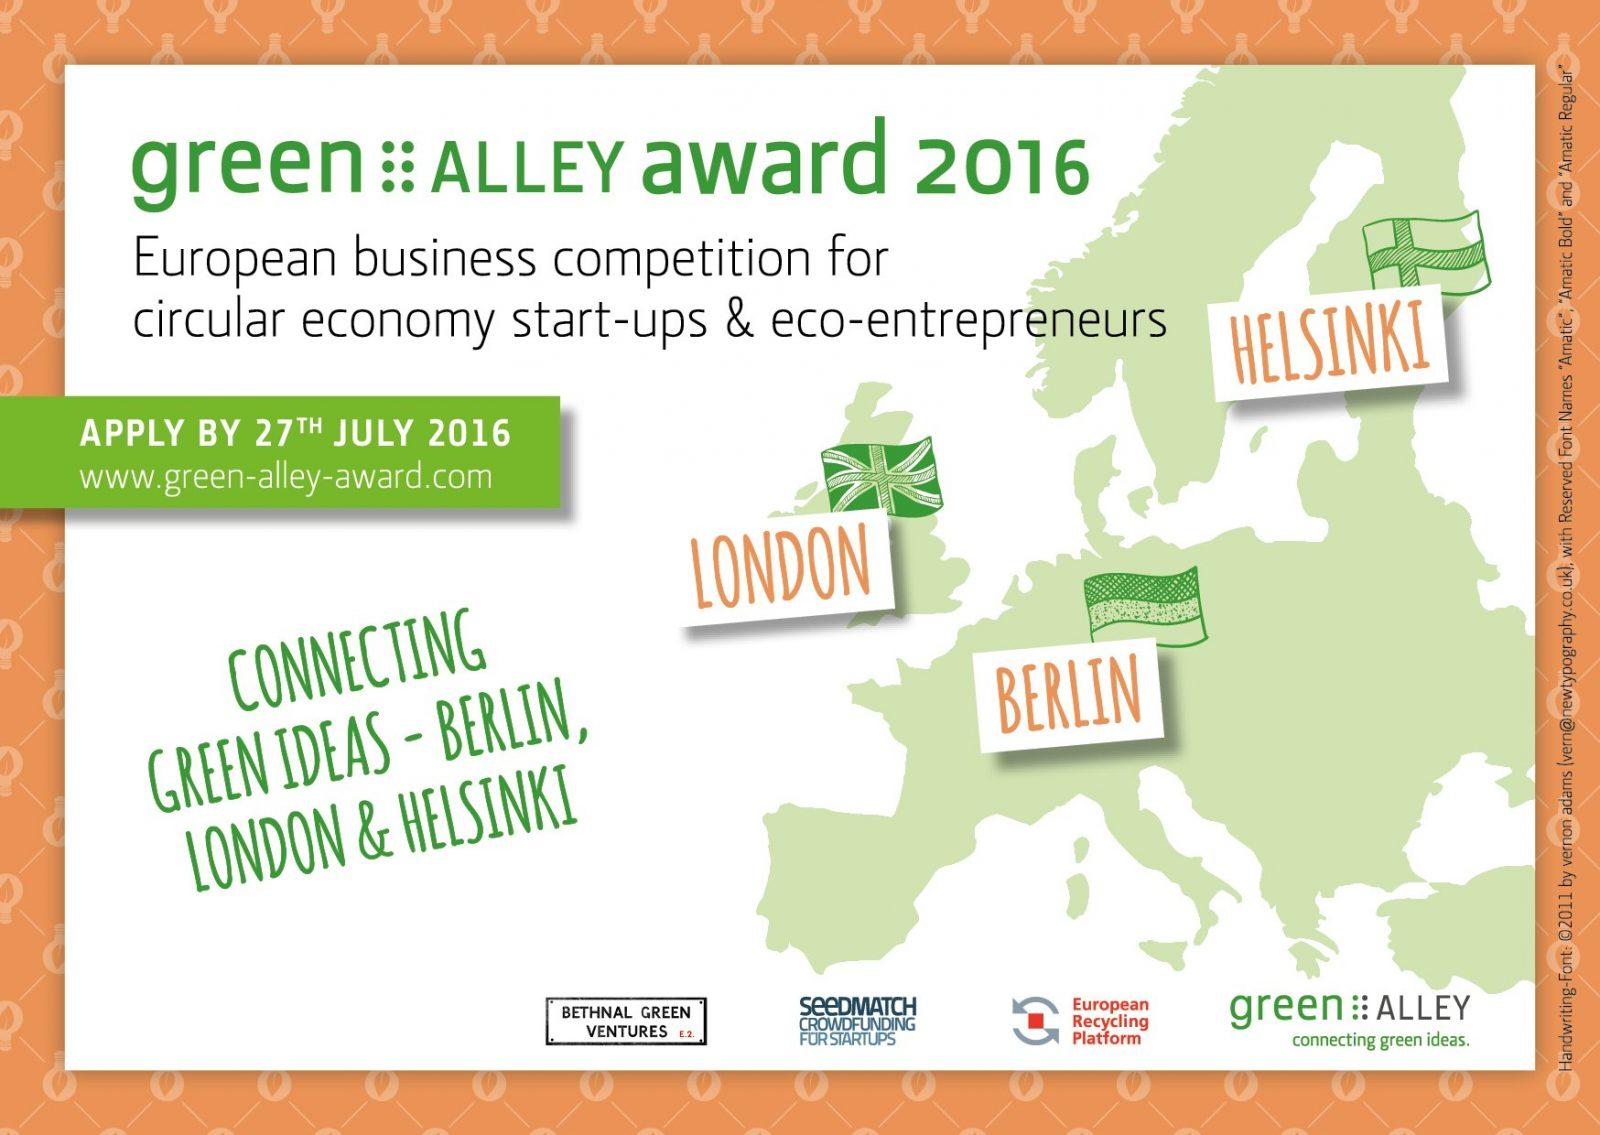 The Green Alley Award